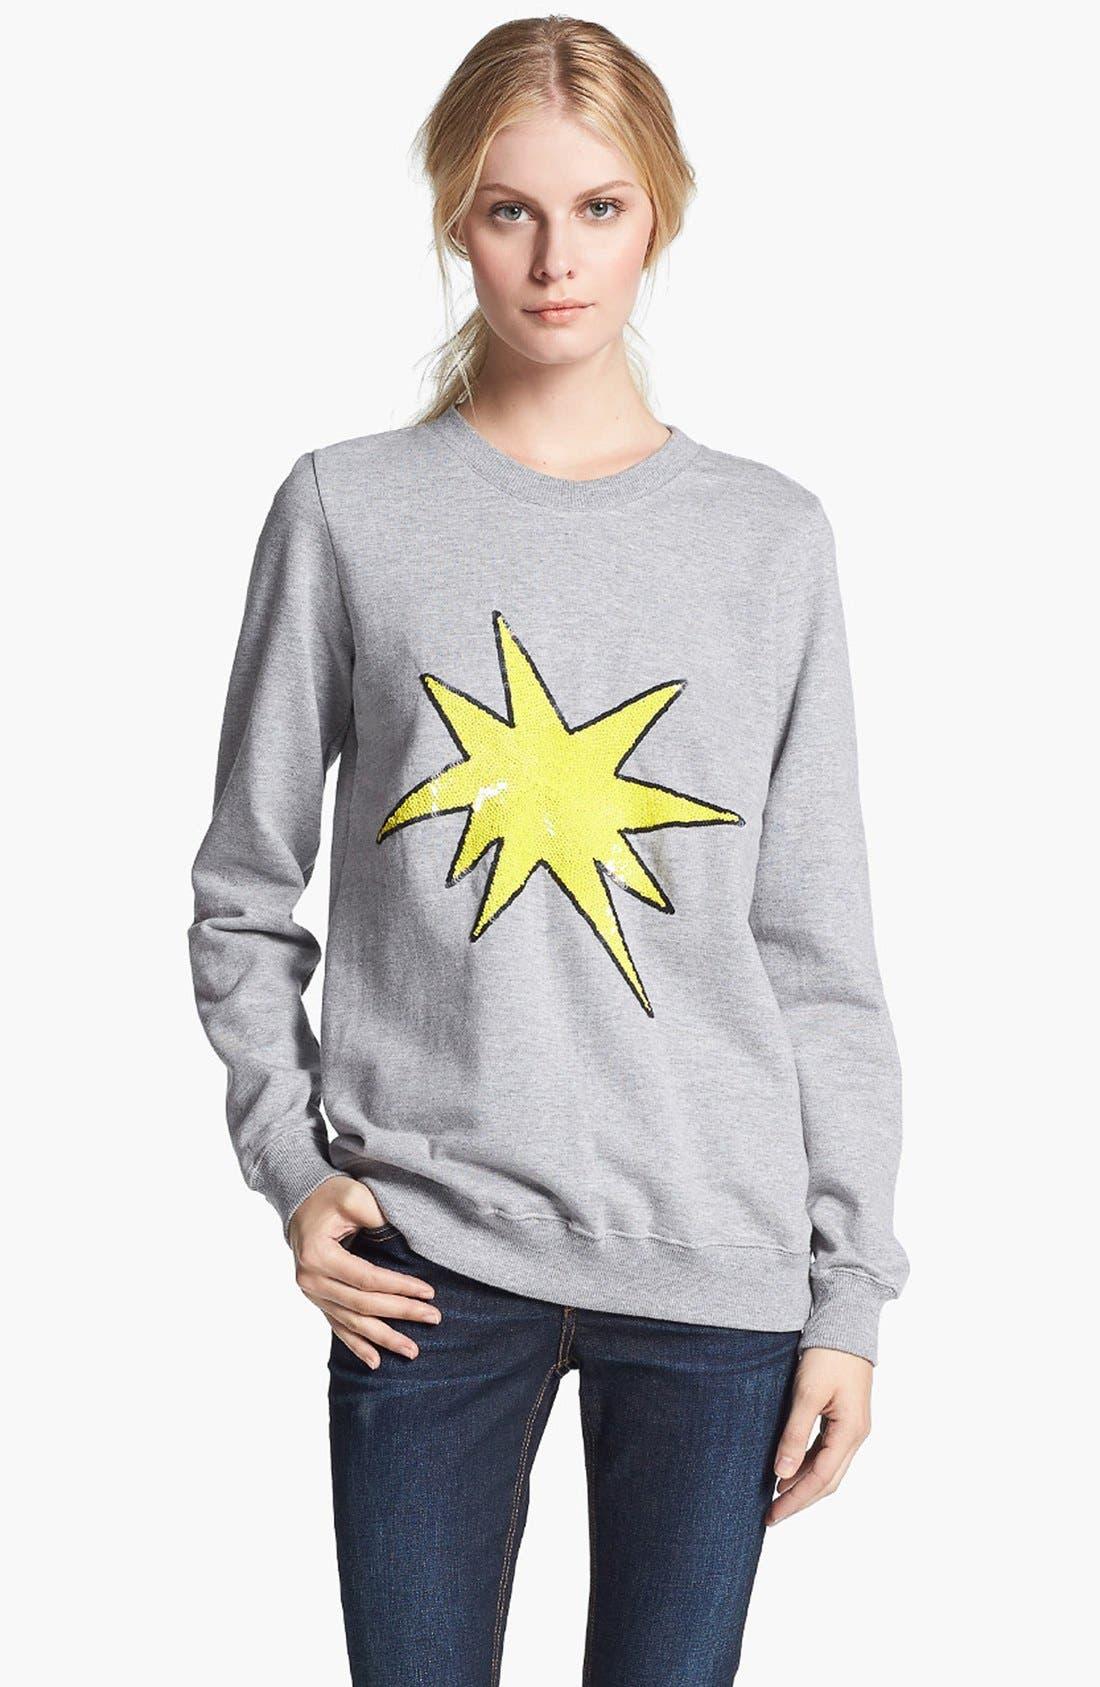 Main Image - Markus Lupfer 'Explosive Star' Sweatshirt